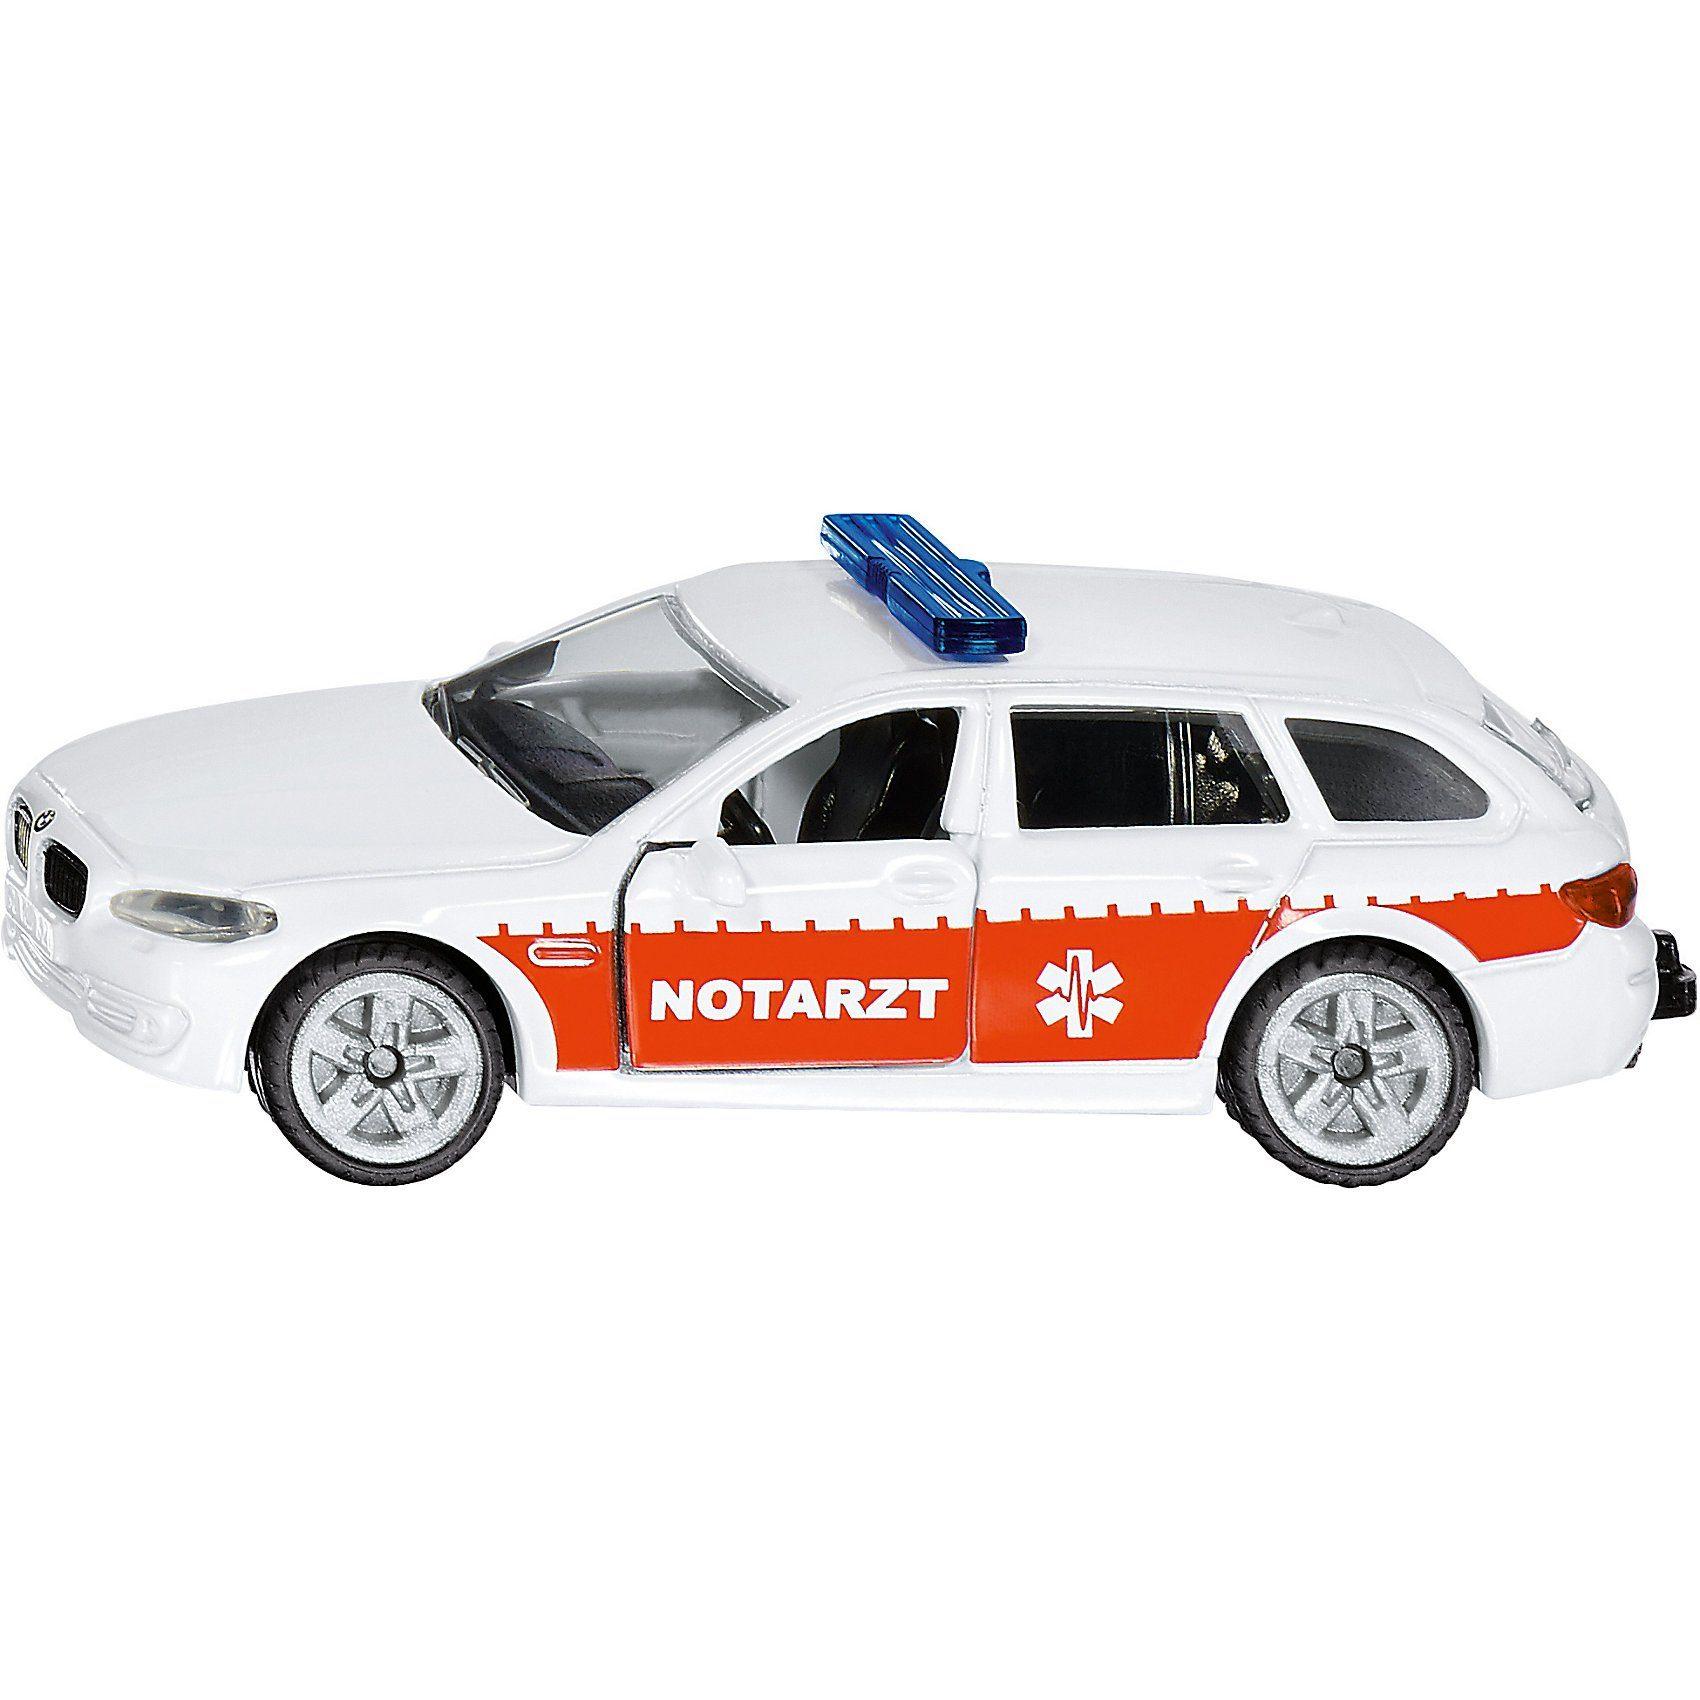 Siku 1461 Notarzt Einsatz Fahrzeug